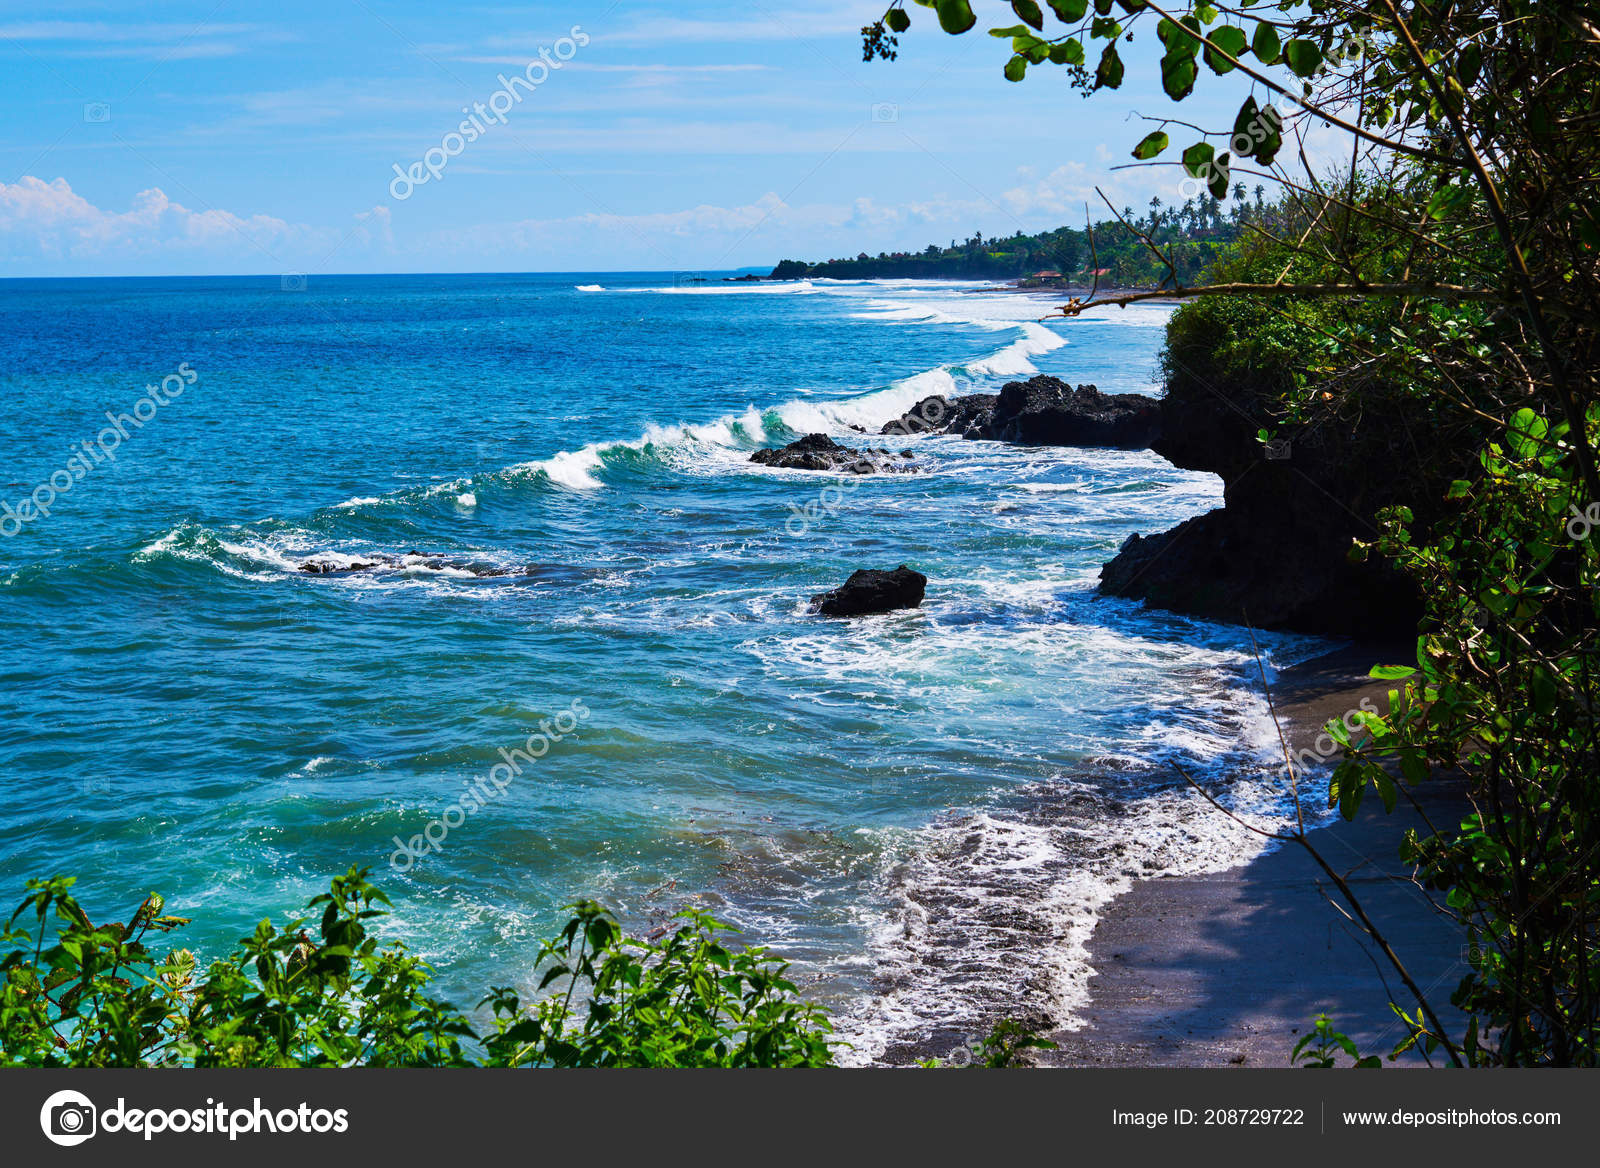 Pictures Ocean Scenery Wallpaper Beach Scene Tropical